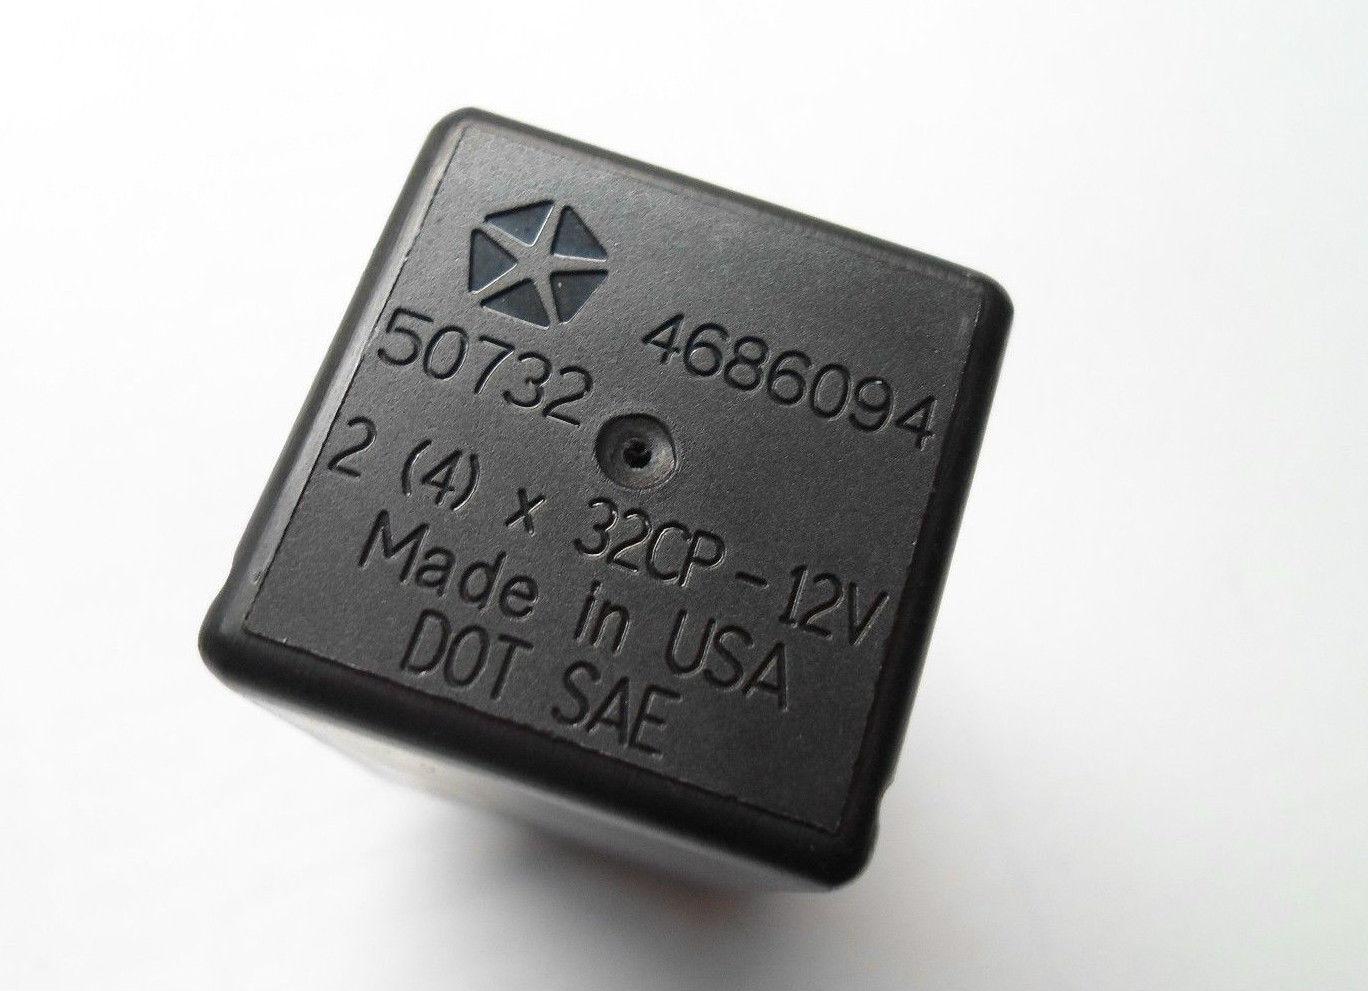 turn signal flasher 4686094 jeep grand cherokee turn signal flasher relay module tested 1999 2004